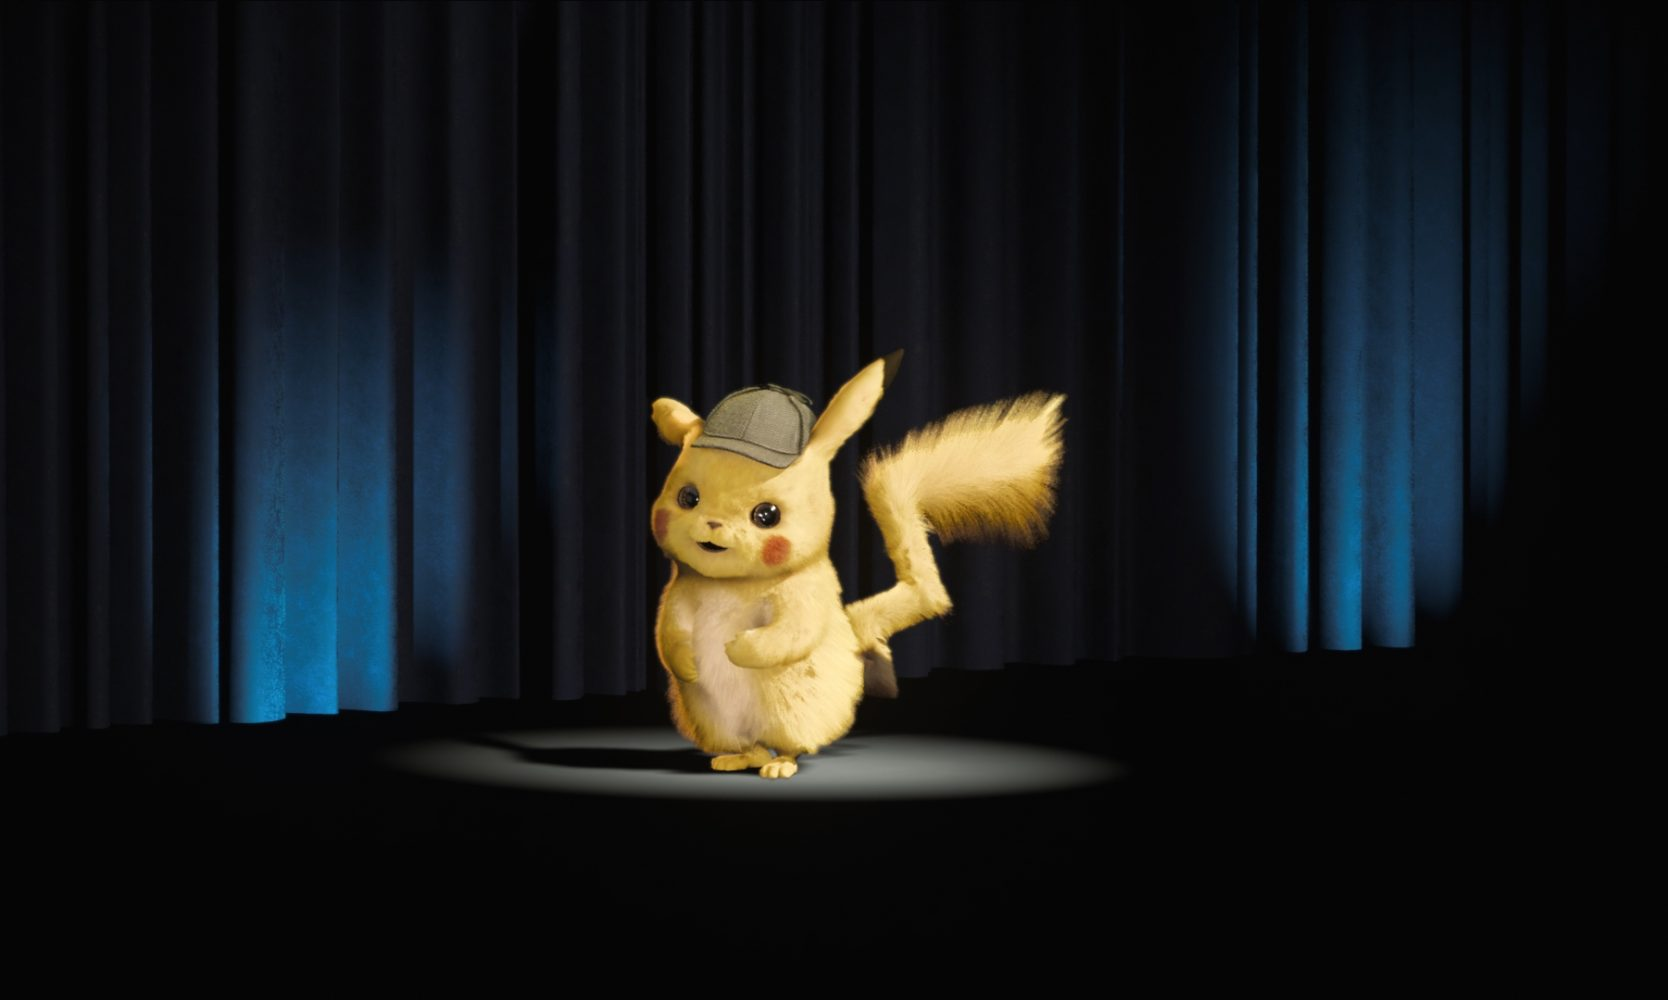 Pikachu Realtime 1